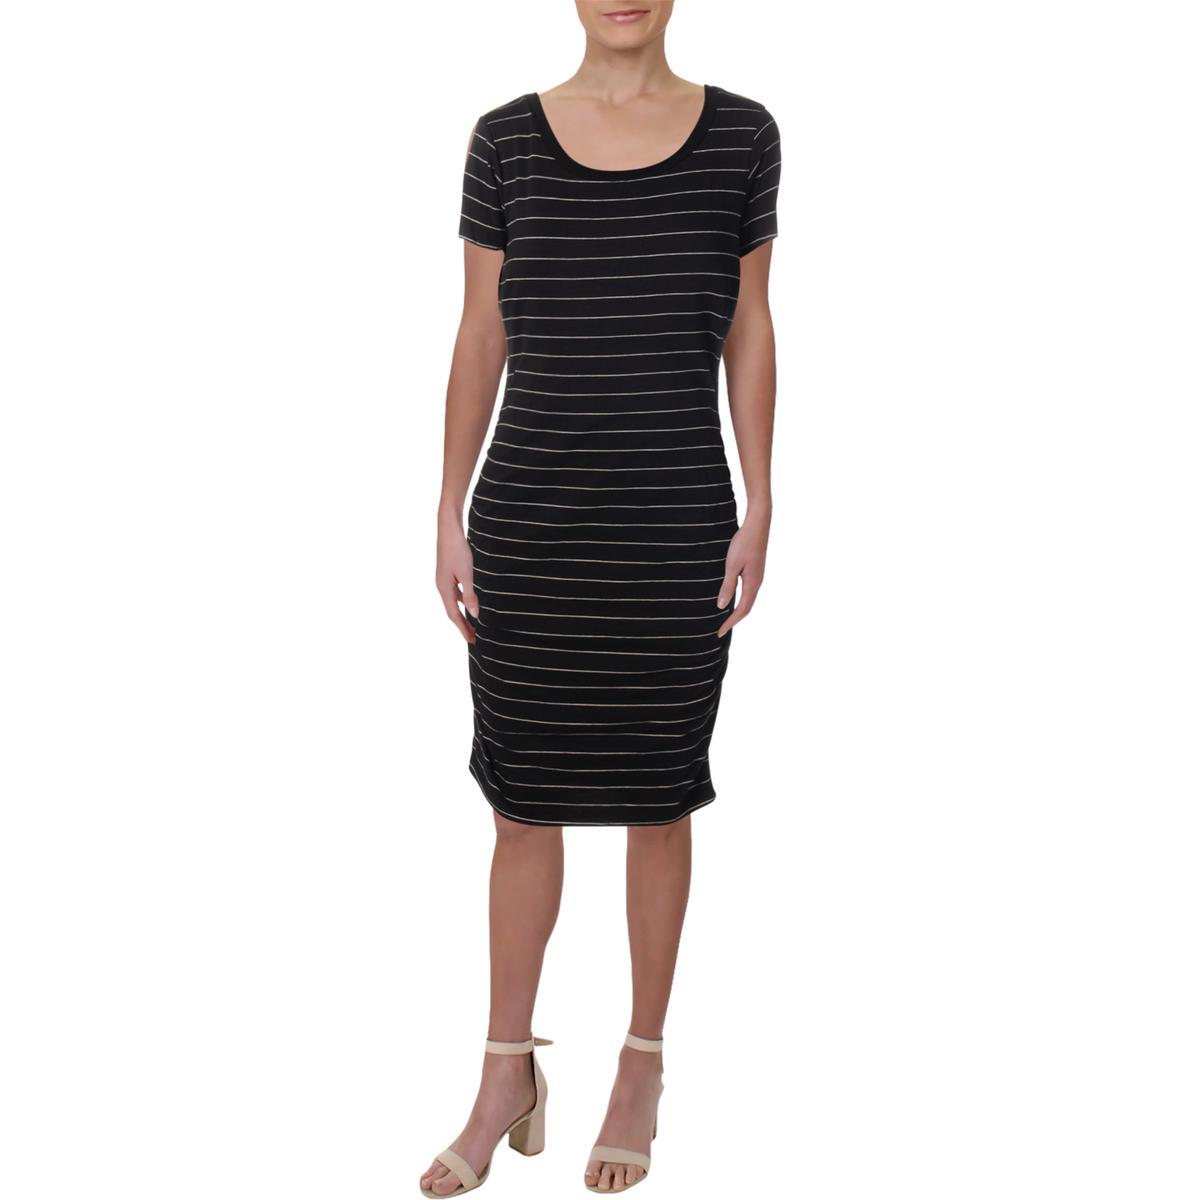 279b7d7475ac0 Sundry Womens Black Cap Sleeves Knee-Length T-Shirt Dress Juniors 3 ...